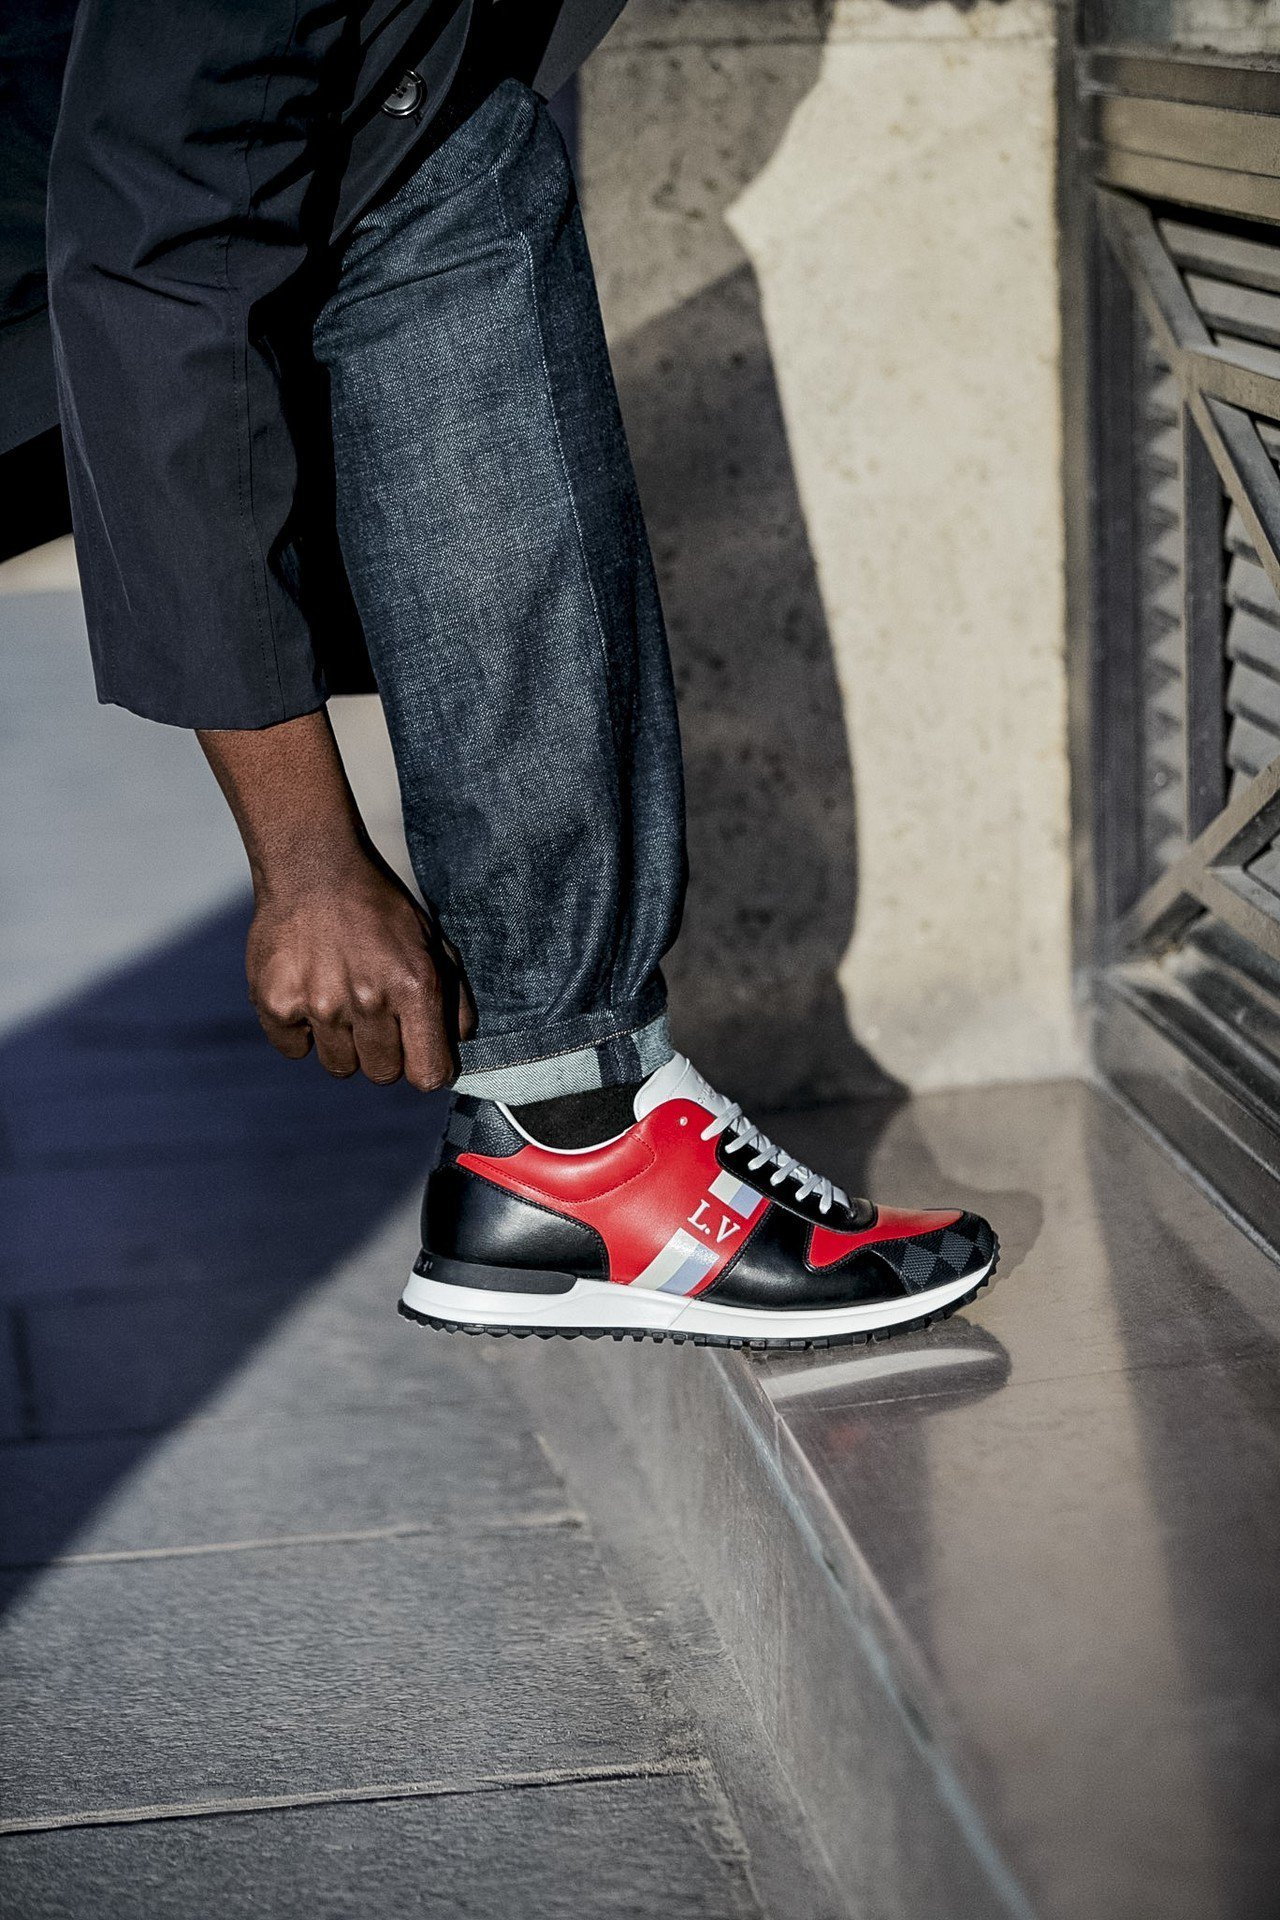 Damier帆布可作為鞋跟點綴設計。圖/LV提供